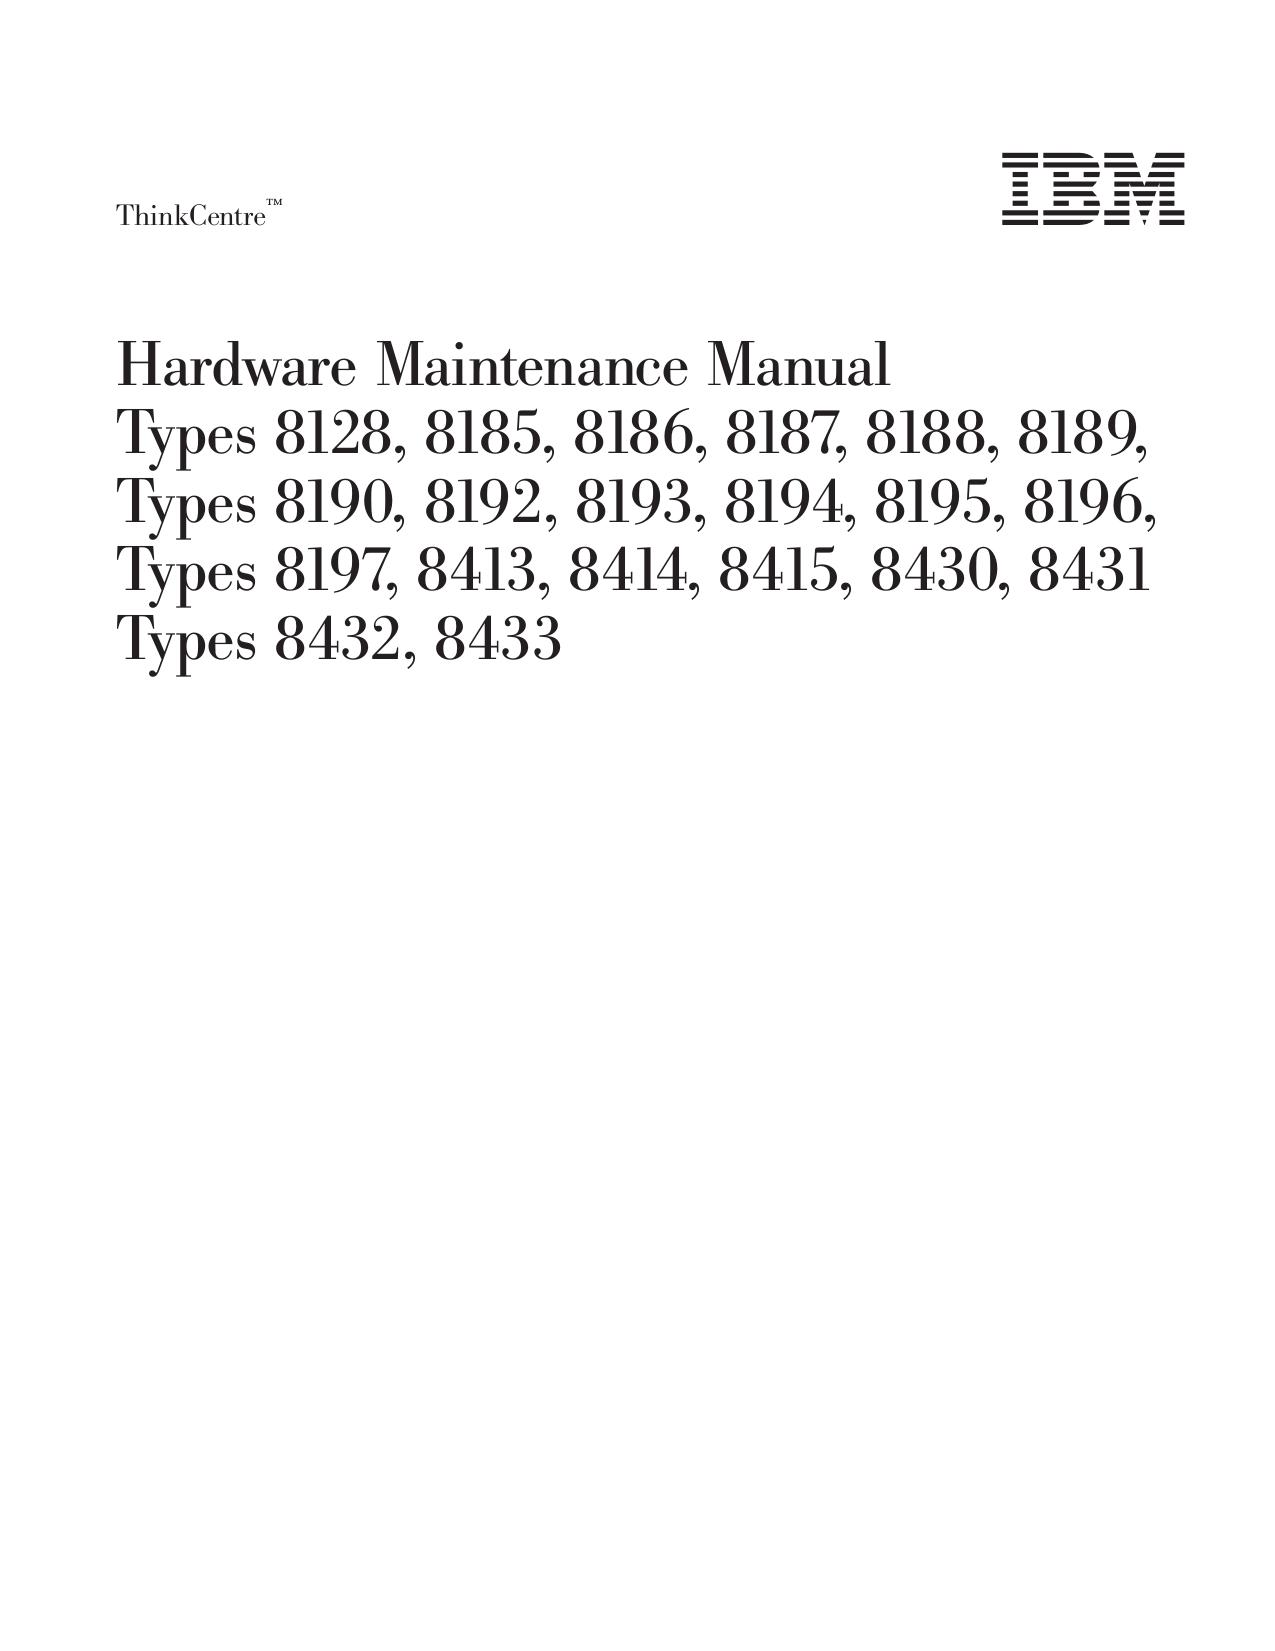 pdf for Lenovo Desktop ThinkCentre A50p 8433 manual